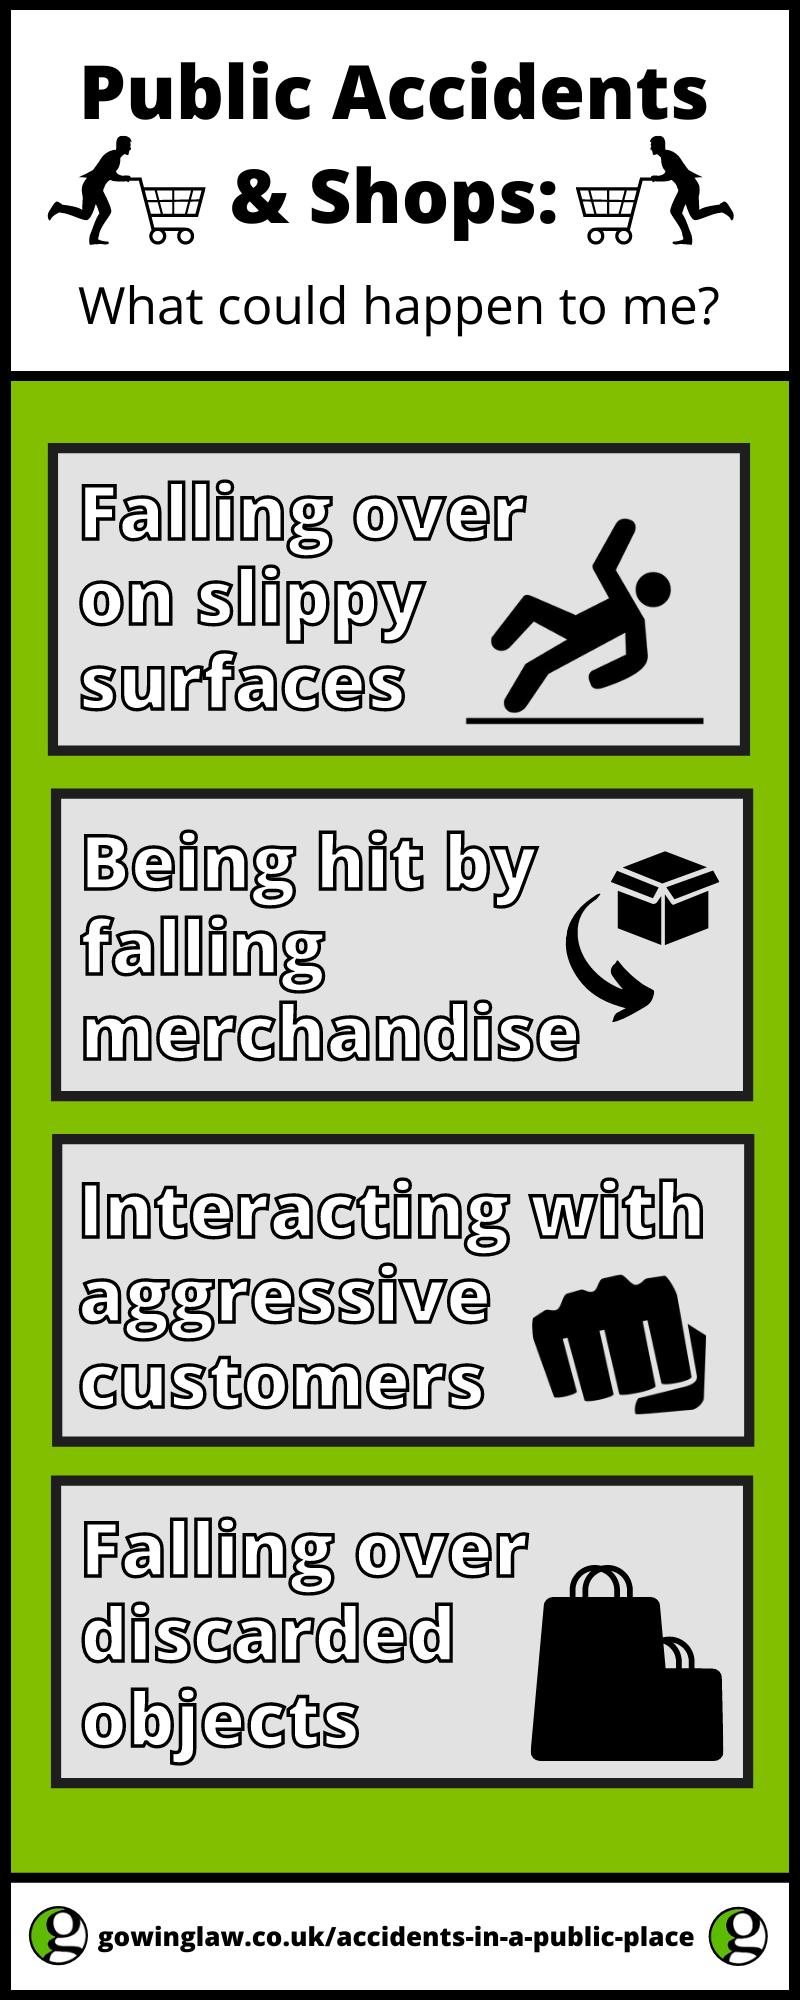 Public Accidents list infographic